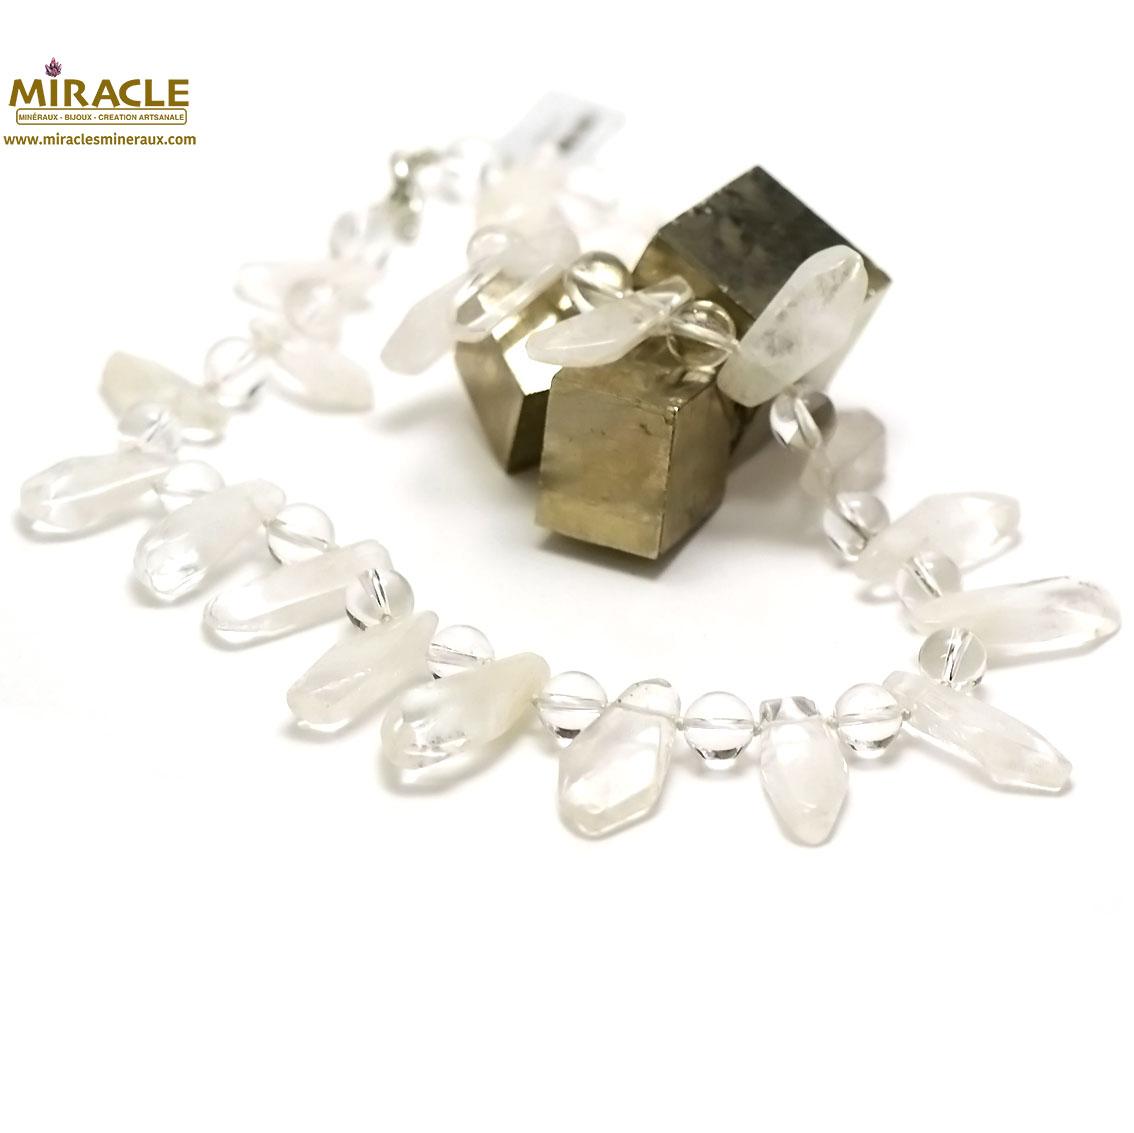 collier cristal de roche ,perle pointe baroque/perle ronde 10 mm